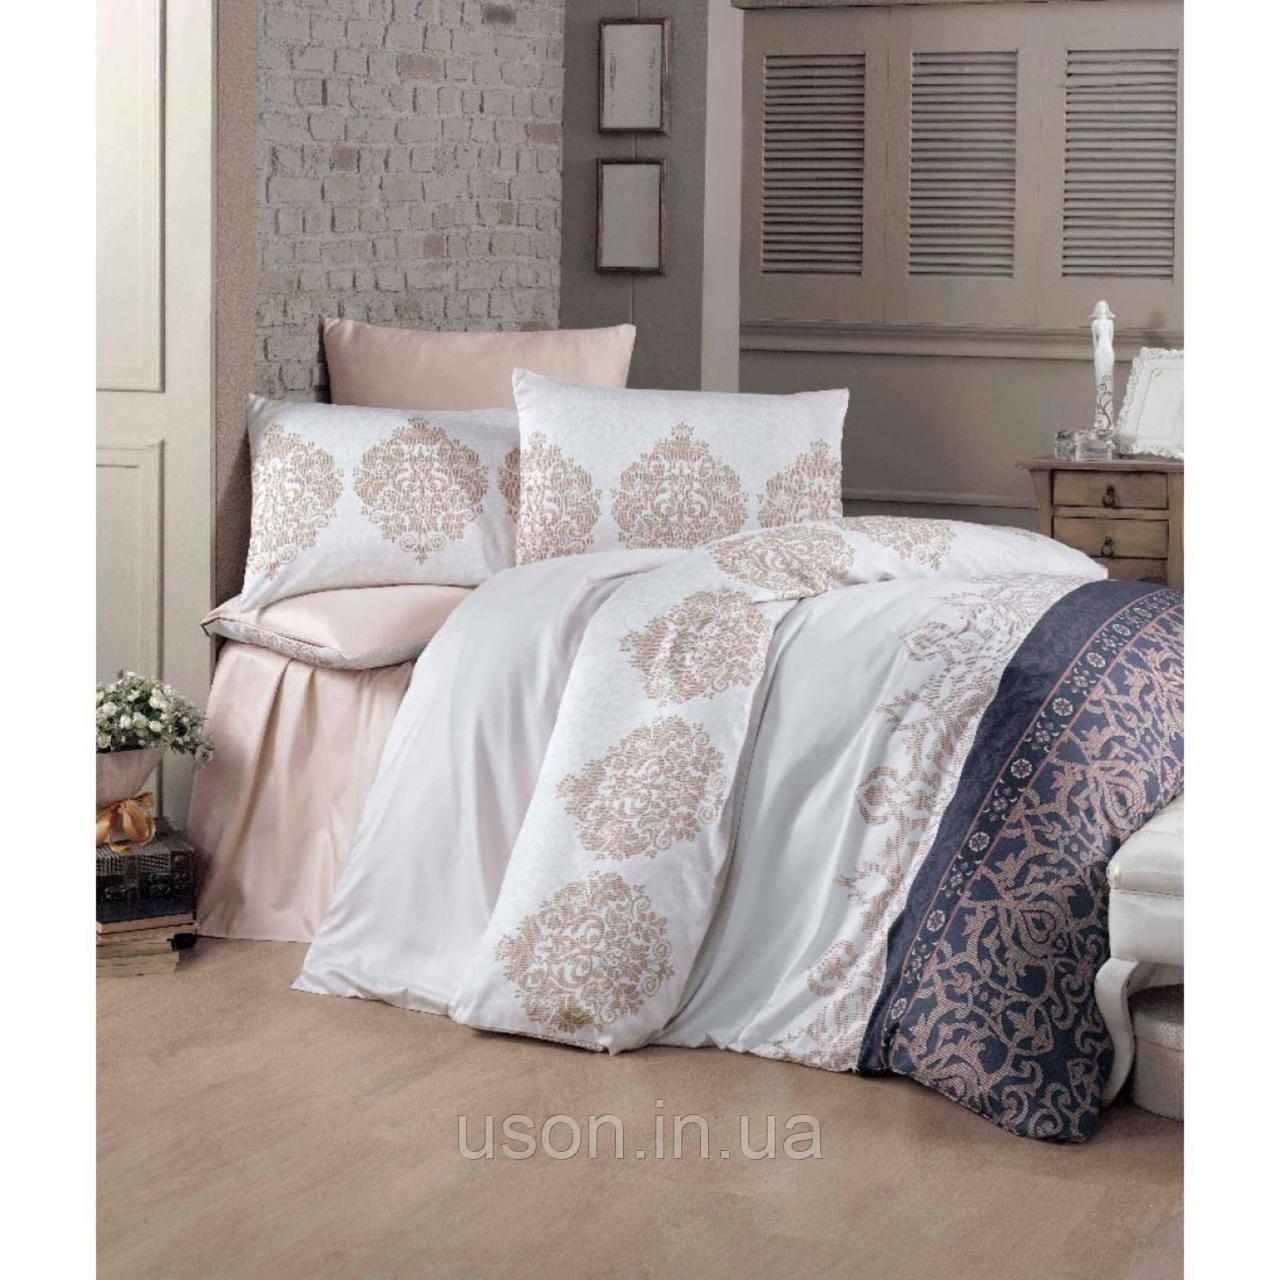 Комплект постельного белья из сатина deluxe евро размер TM Victoria Asrin